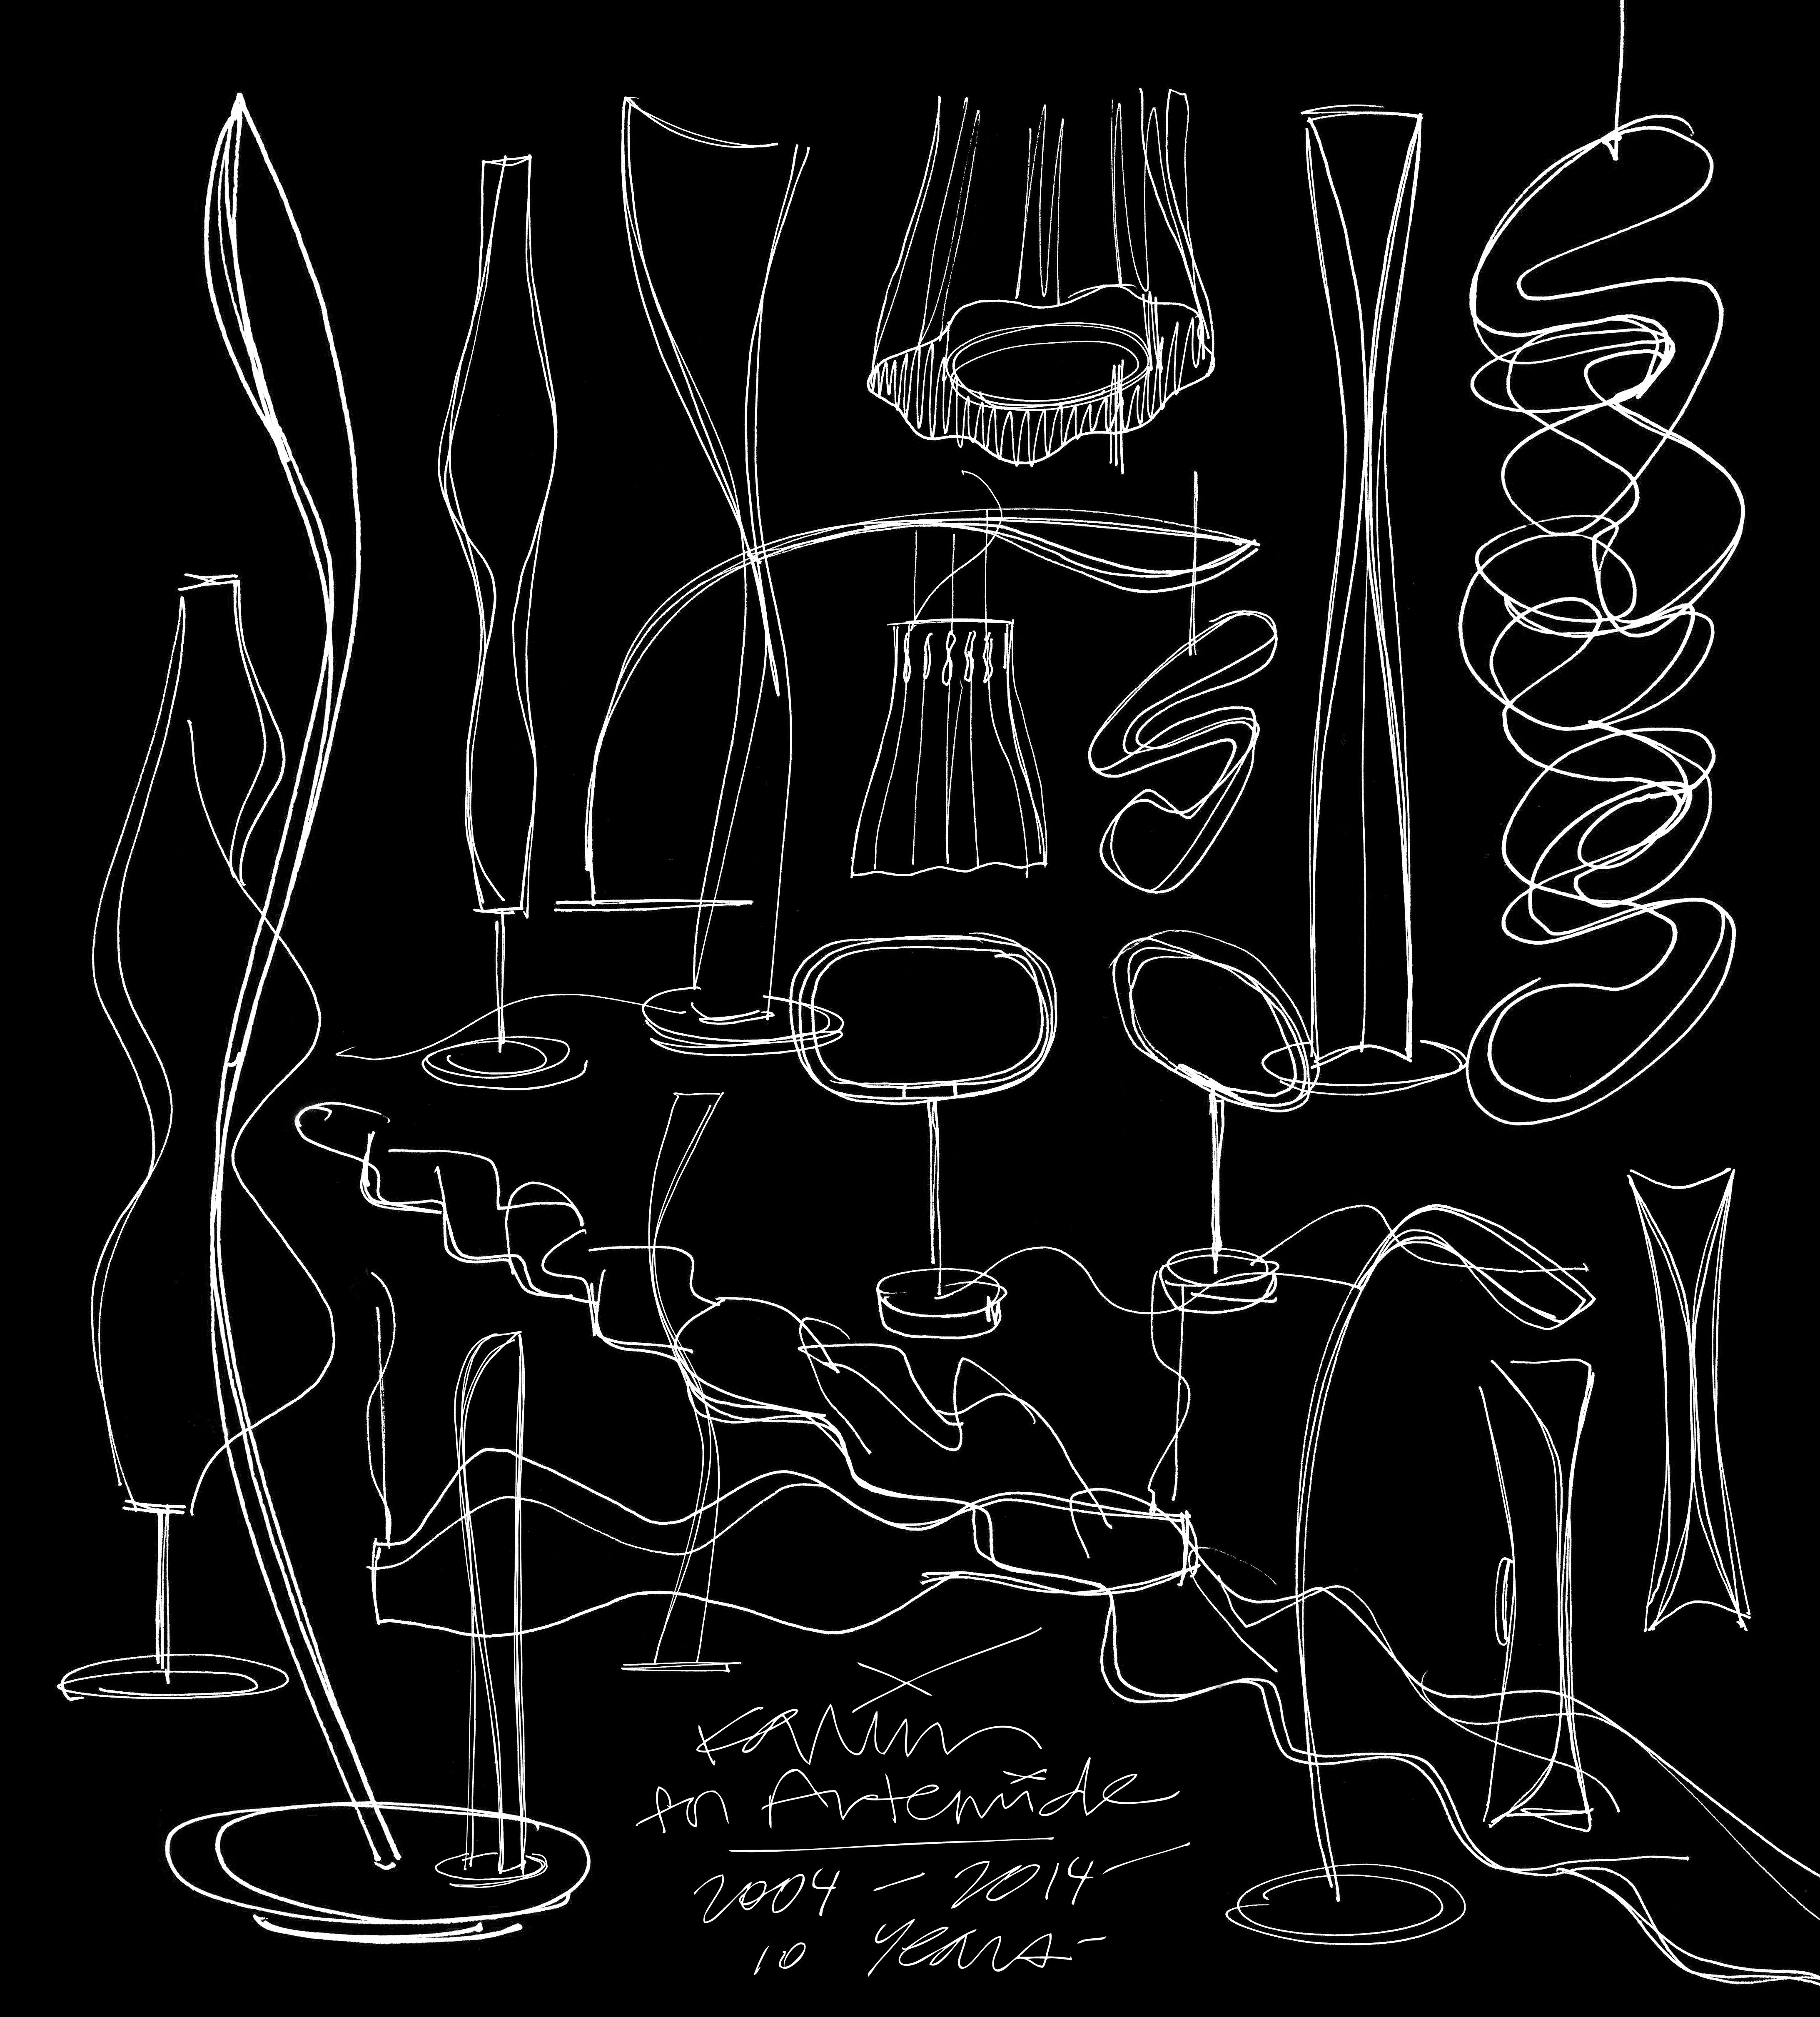 Artemide Stehle sketches of artemide light by karim rashid http on fb me 1uavu5x